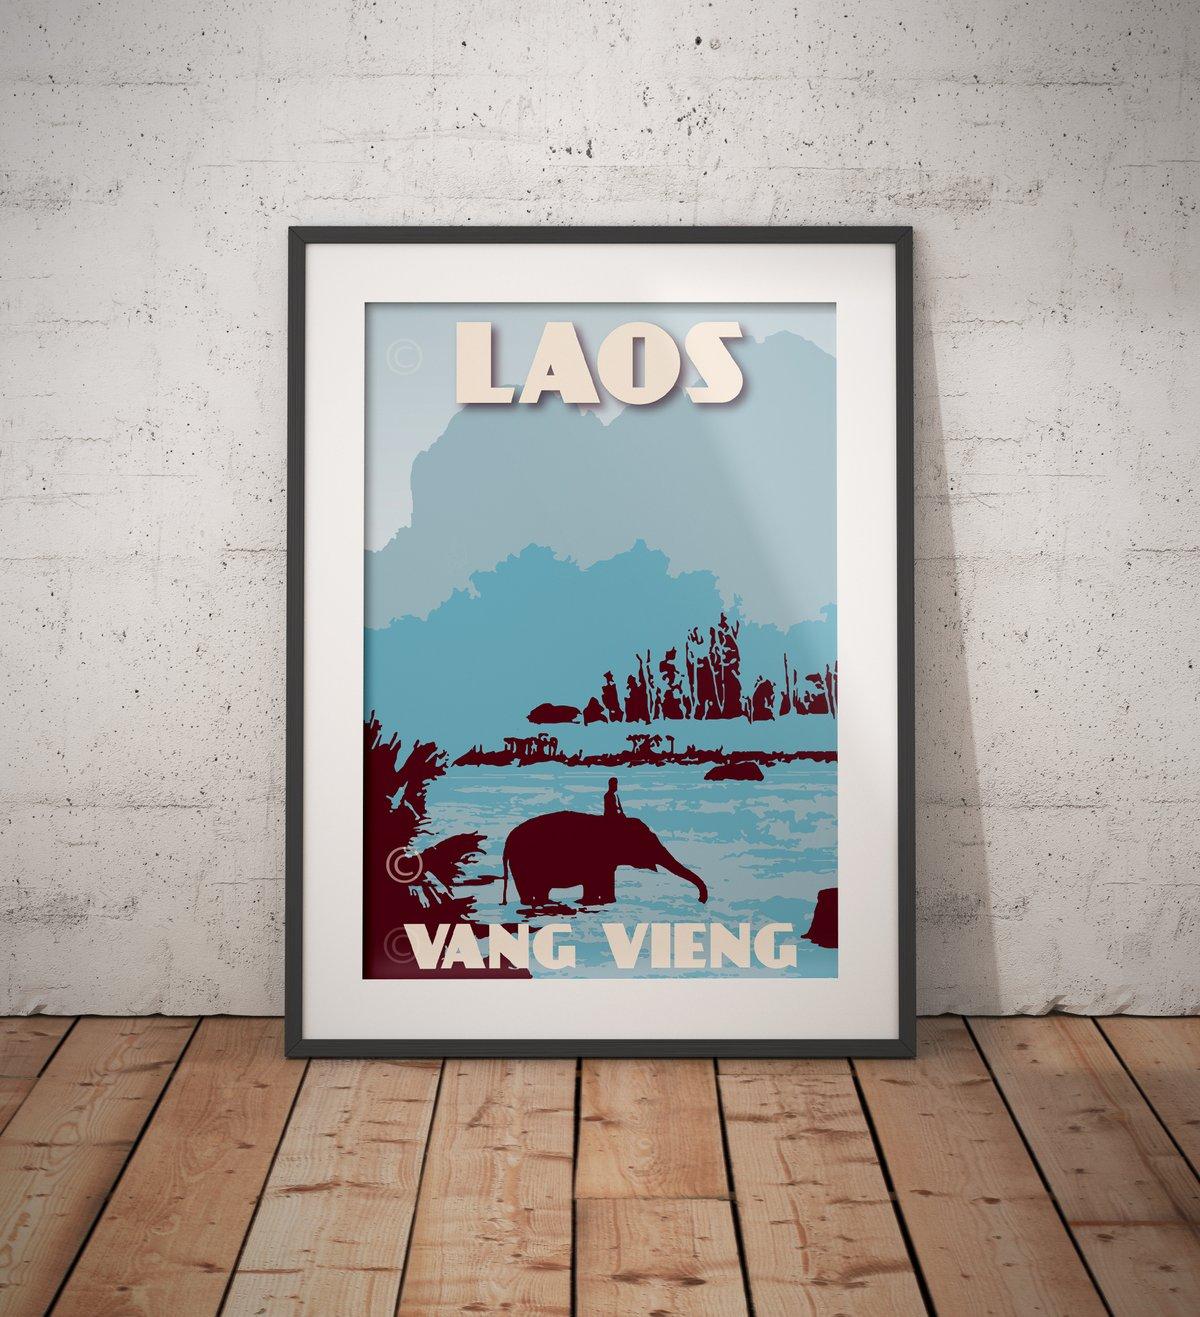 Image of Vintage poster Laos - VangVieng - Nam Song River - Fine Art Print - Blue